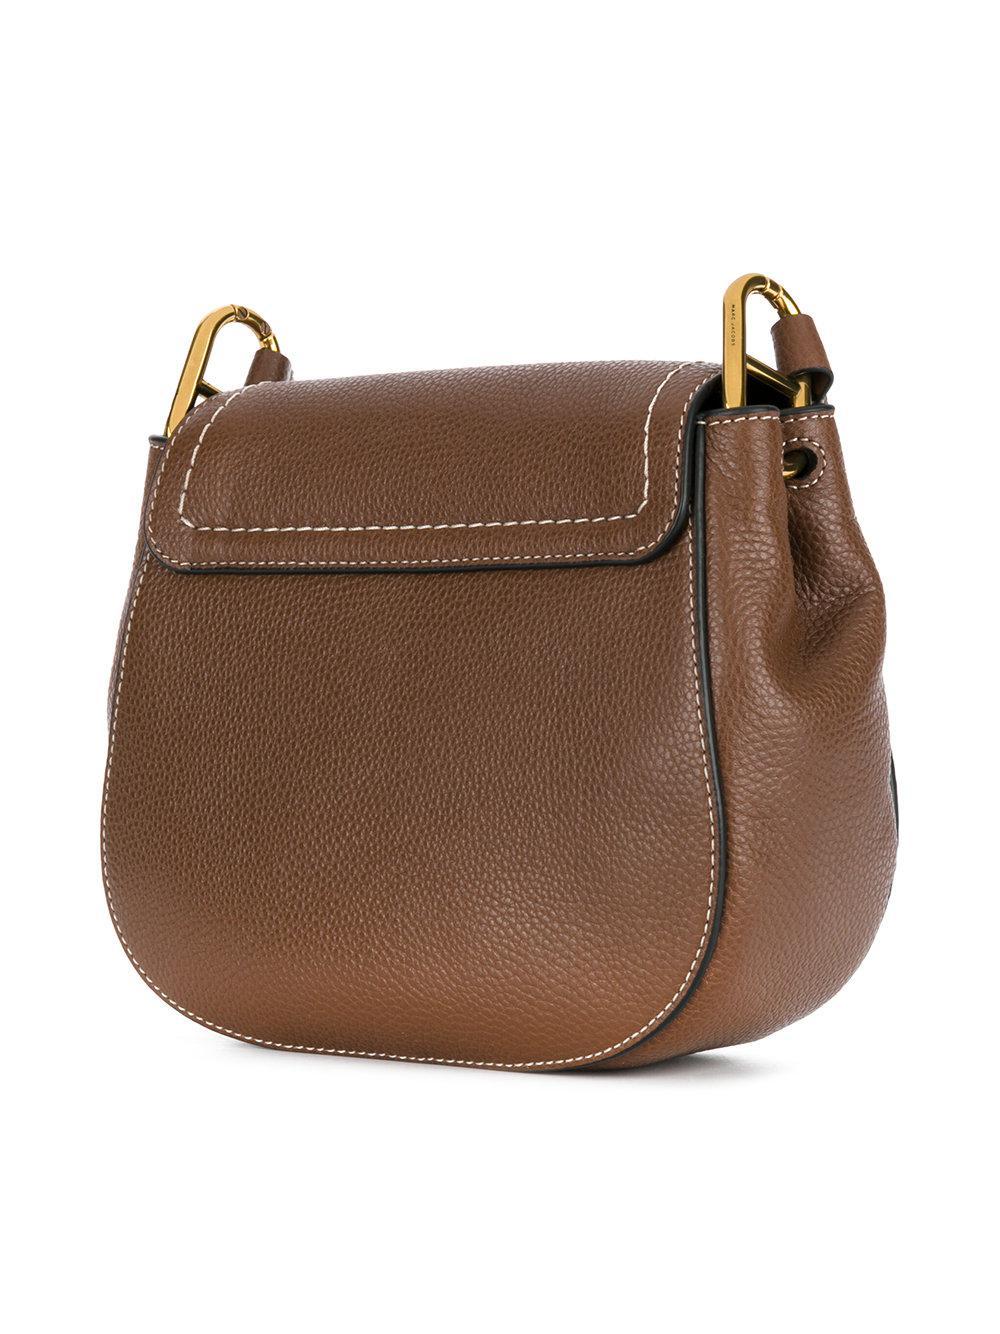 5308682a5a86 Lyst - Marc Jacobs Mini Maverick Shoulder Bag in Brown